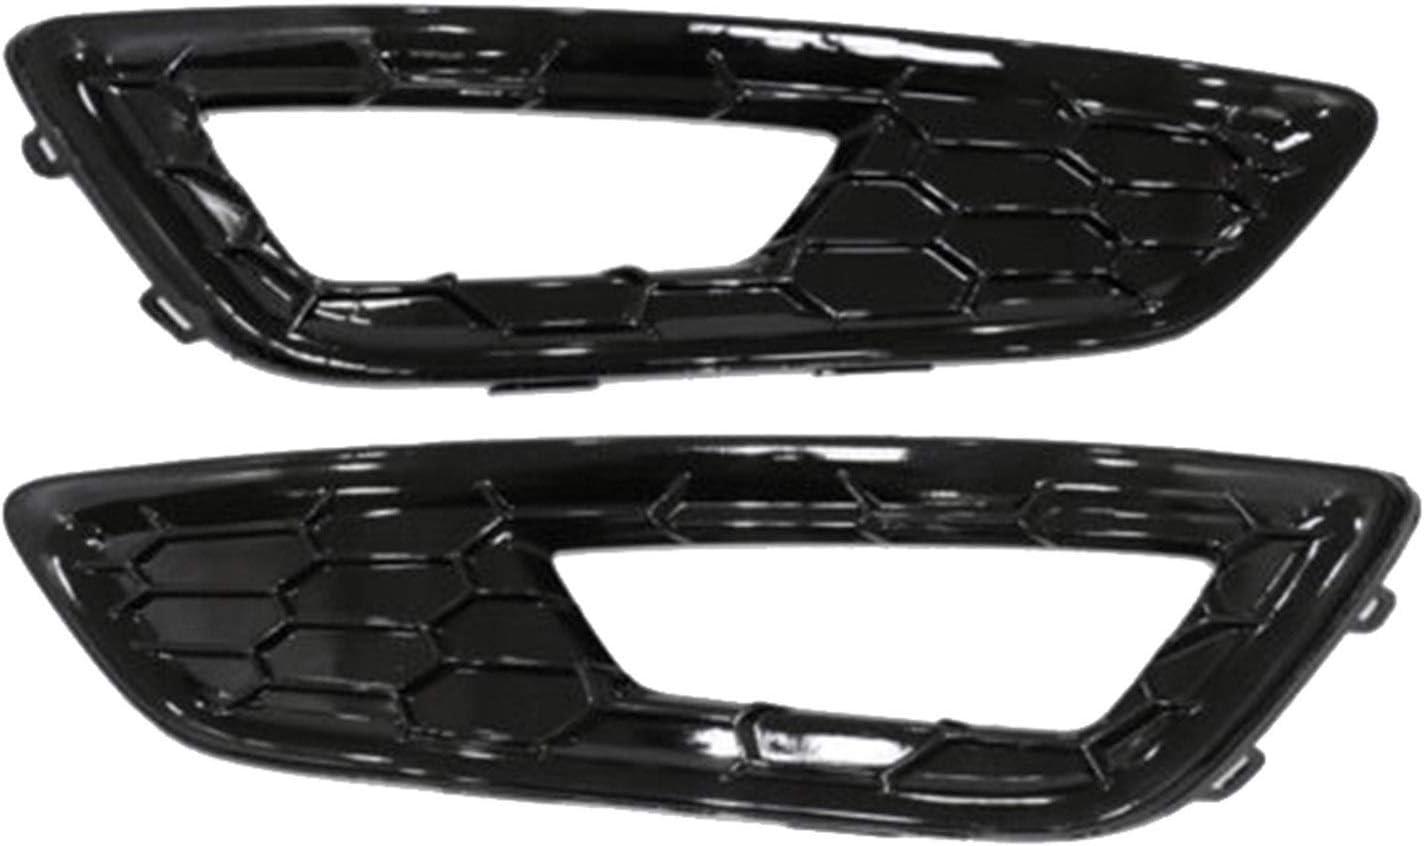 XIAOFANG Frontsto/ßstange Nebelscheinwerfer Abdeckung Grille fit for Ford Focus Sport S SE 2015-2018